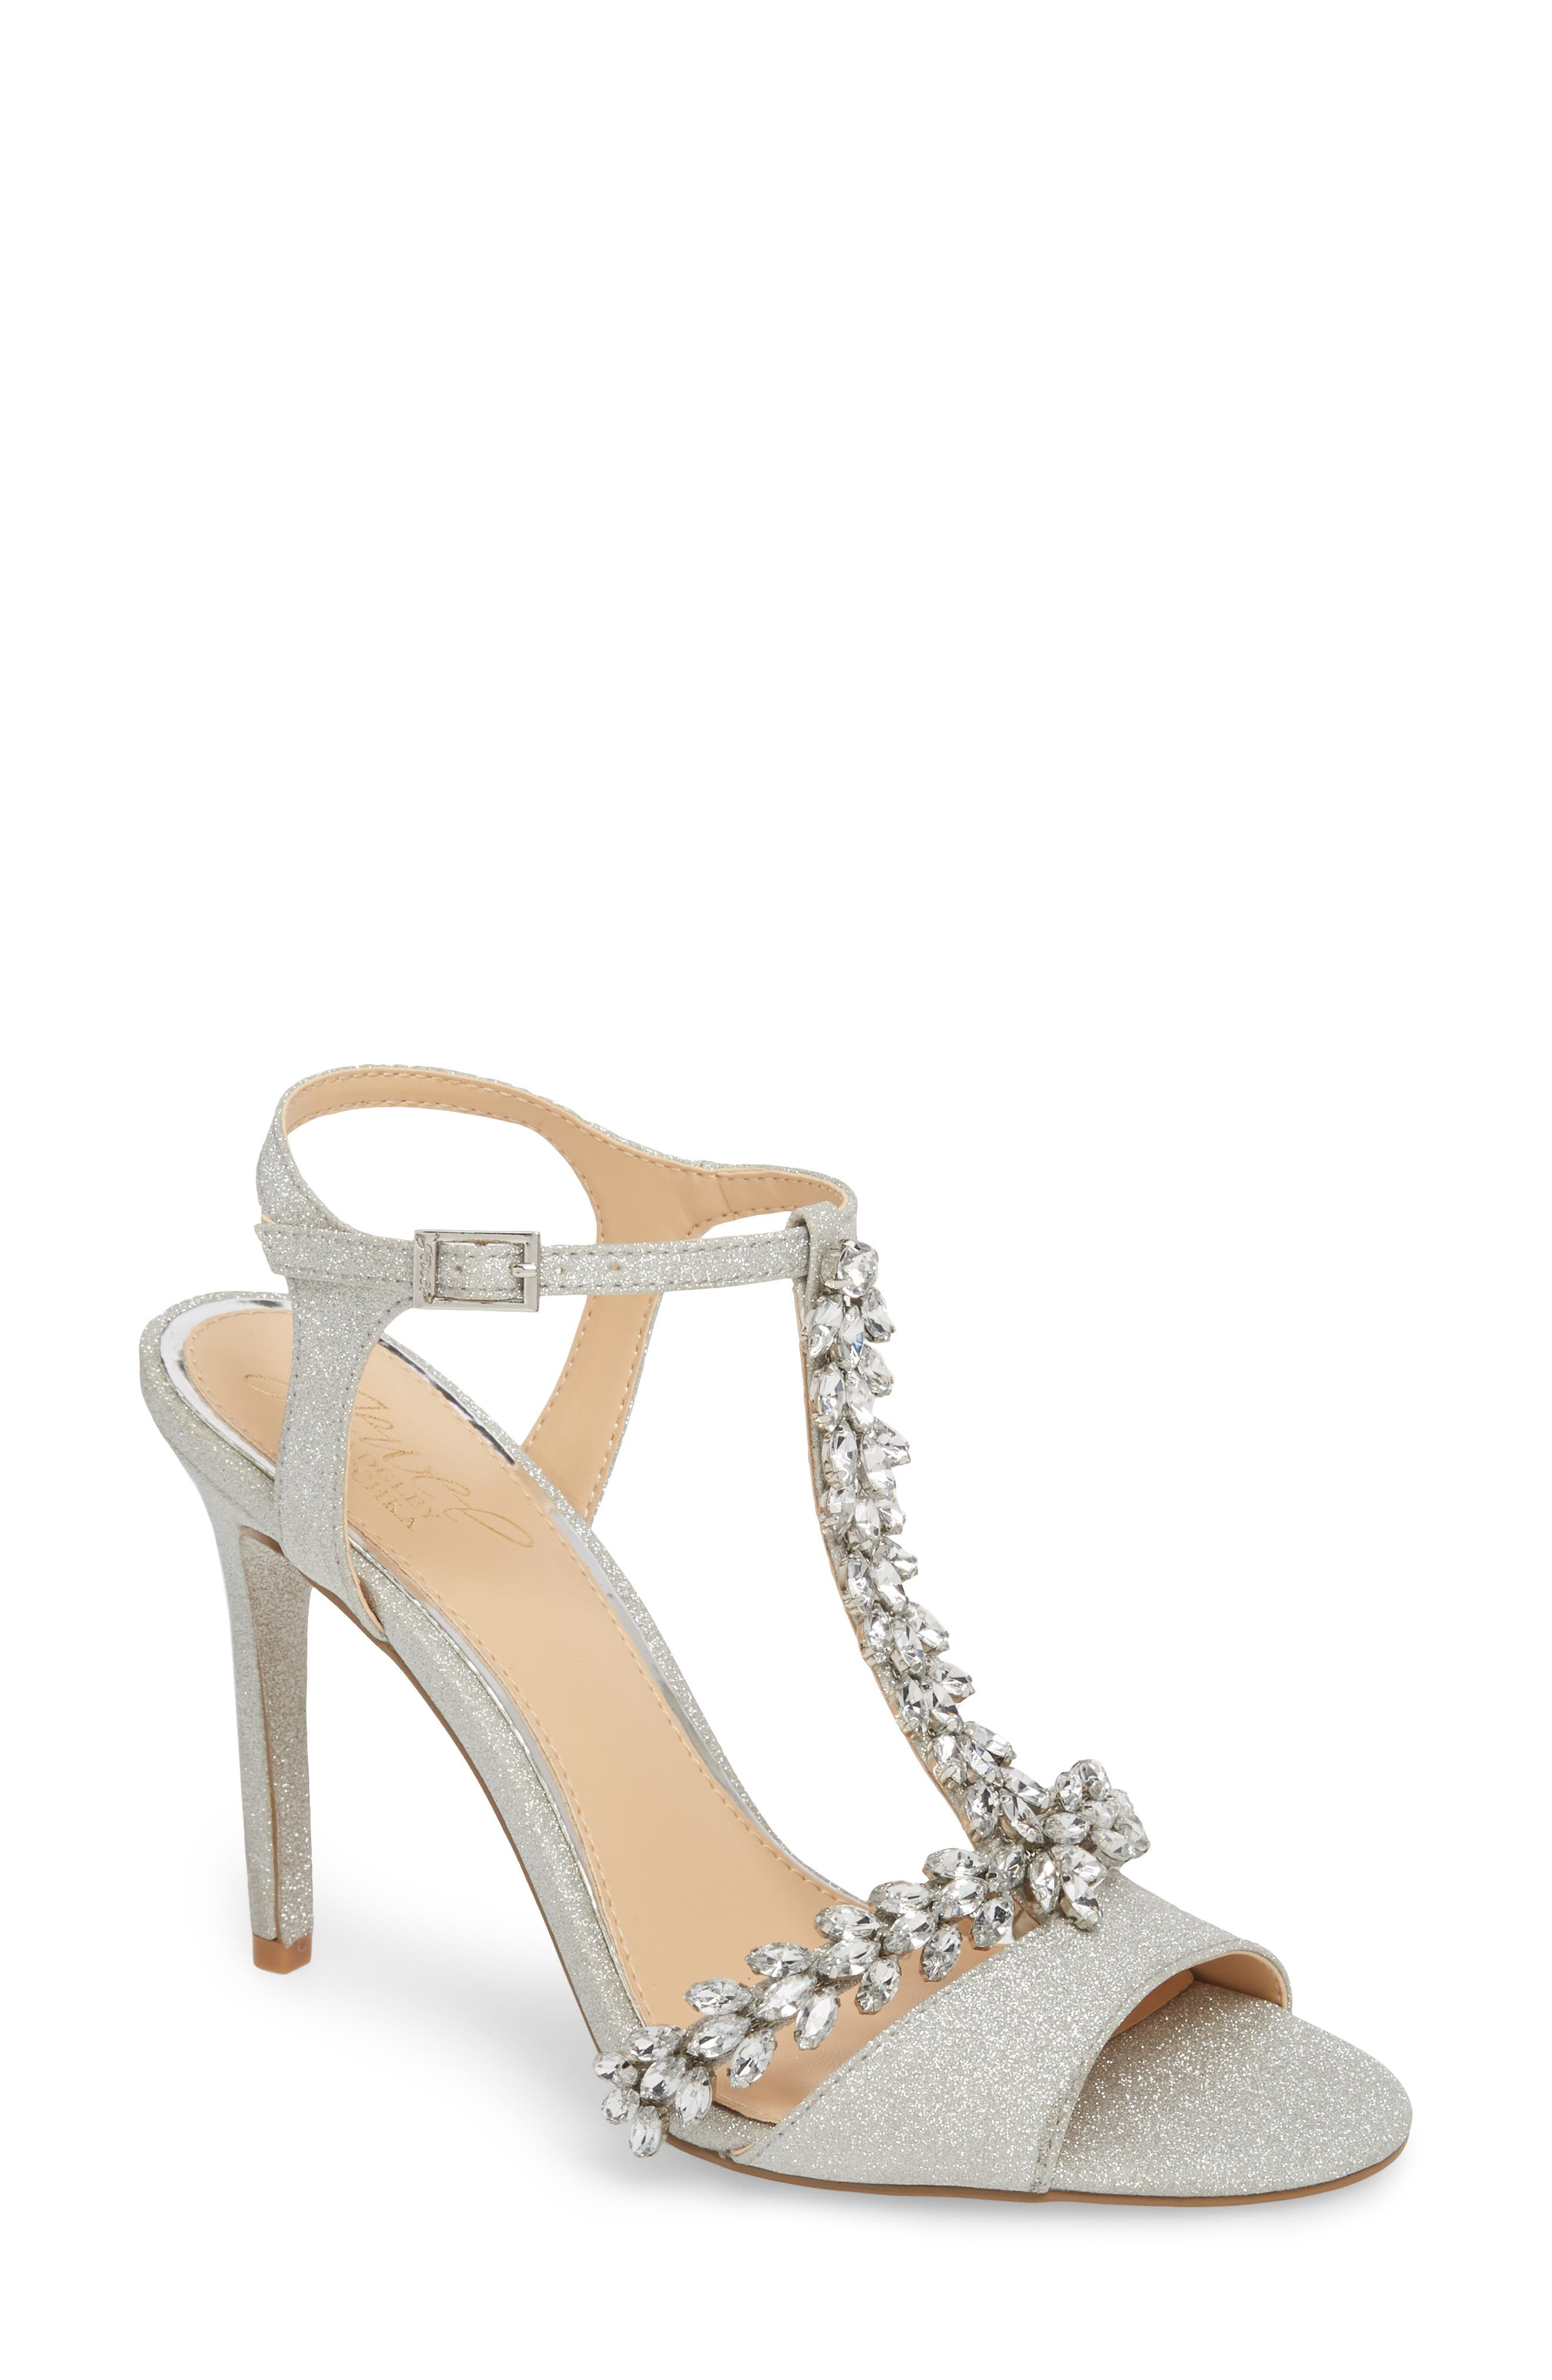 JEWEL BADGLEY MISCHKA, Maxi Crystal Embellished Sandal, Main thumbnail 1, color, SILVER GLITTER FABRIC